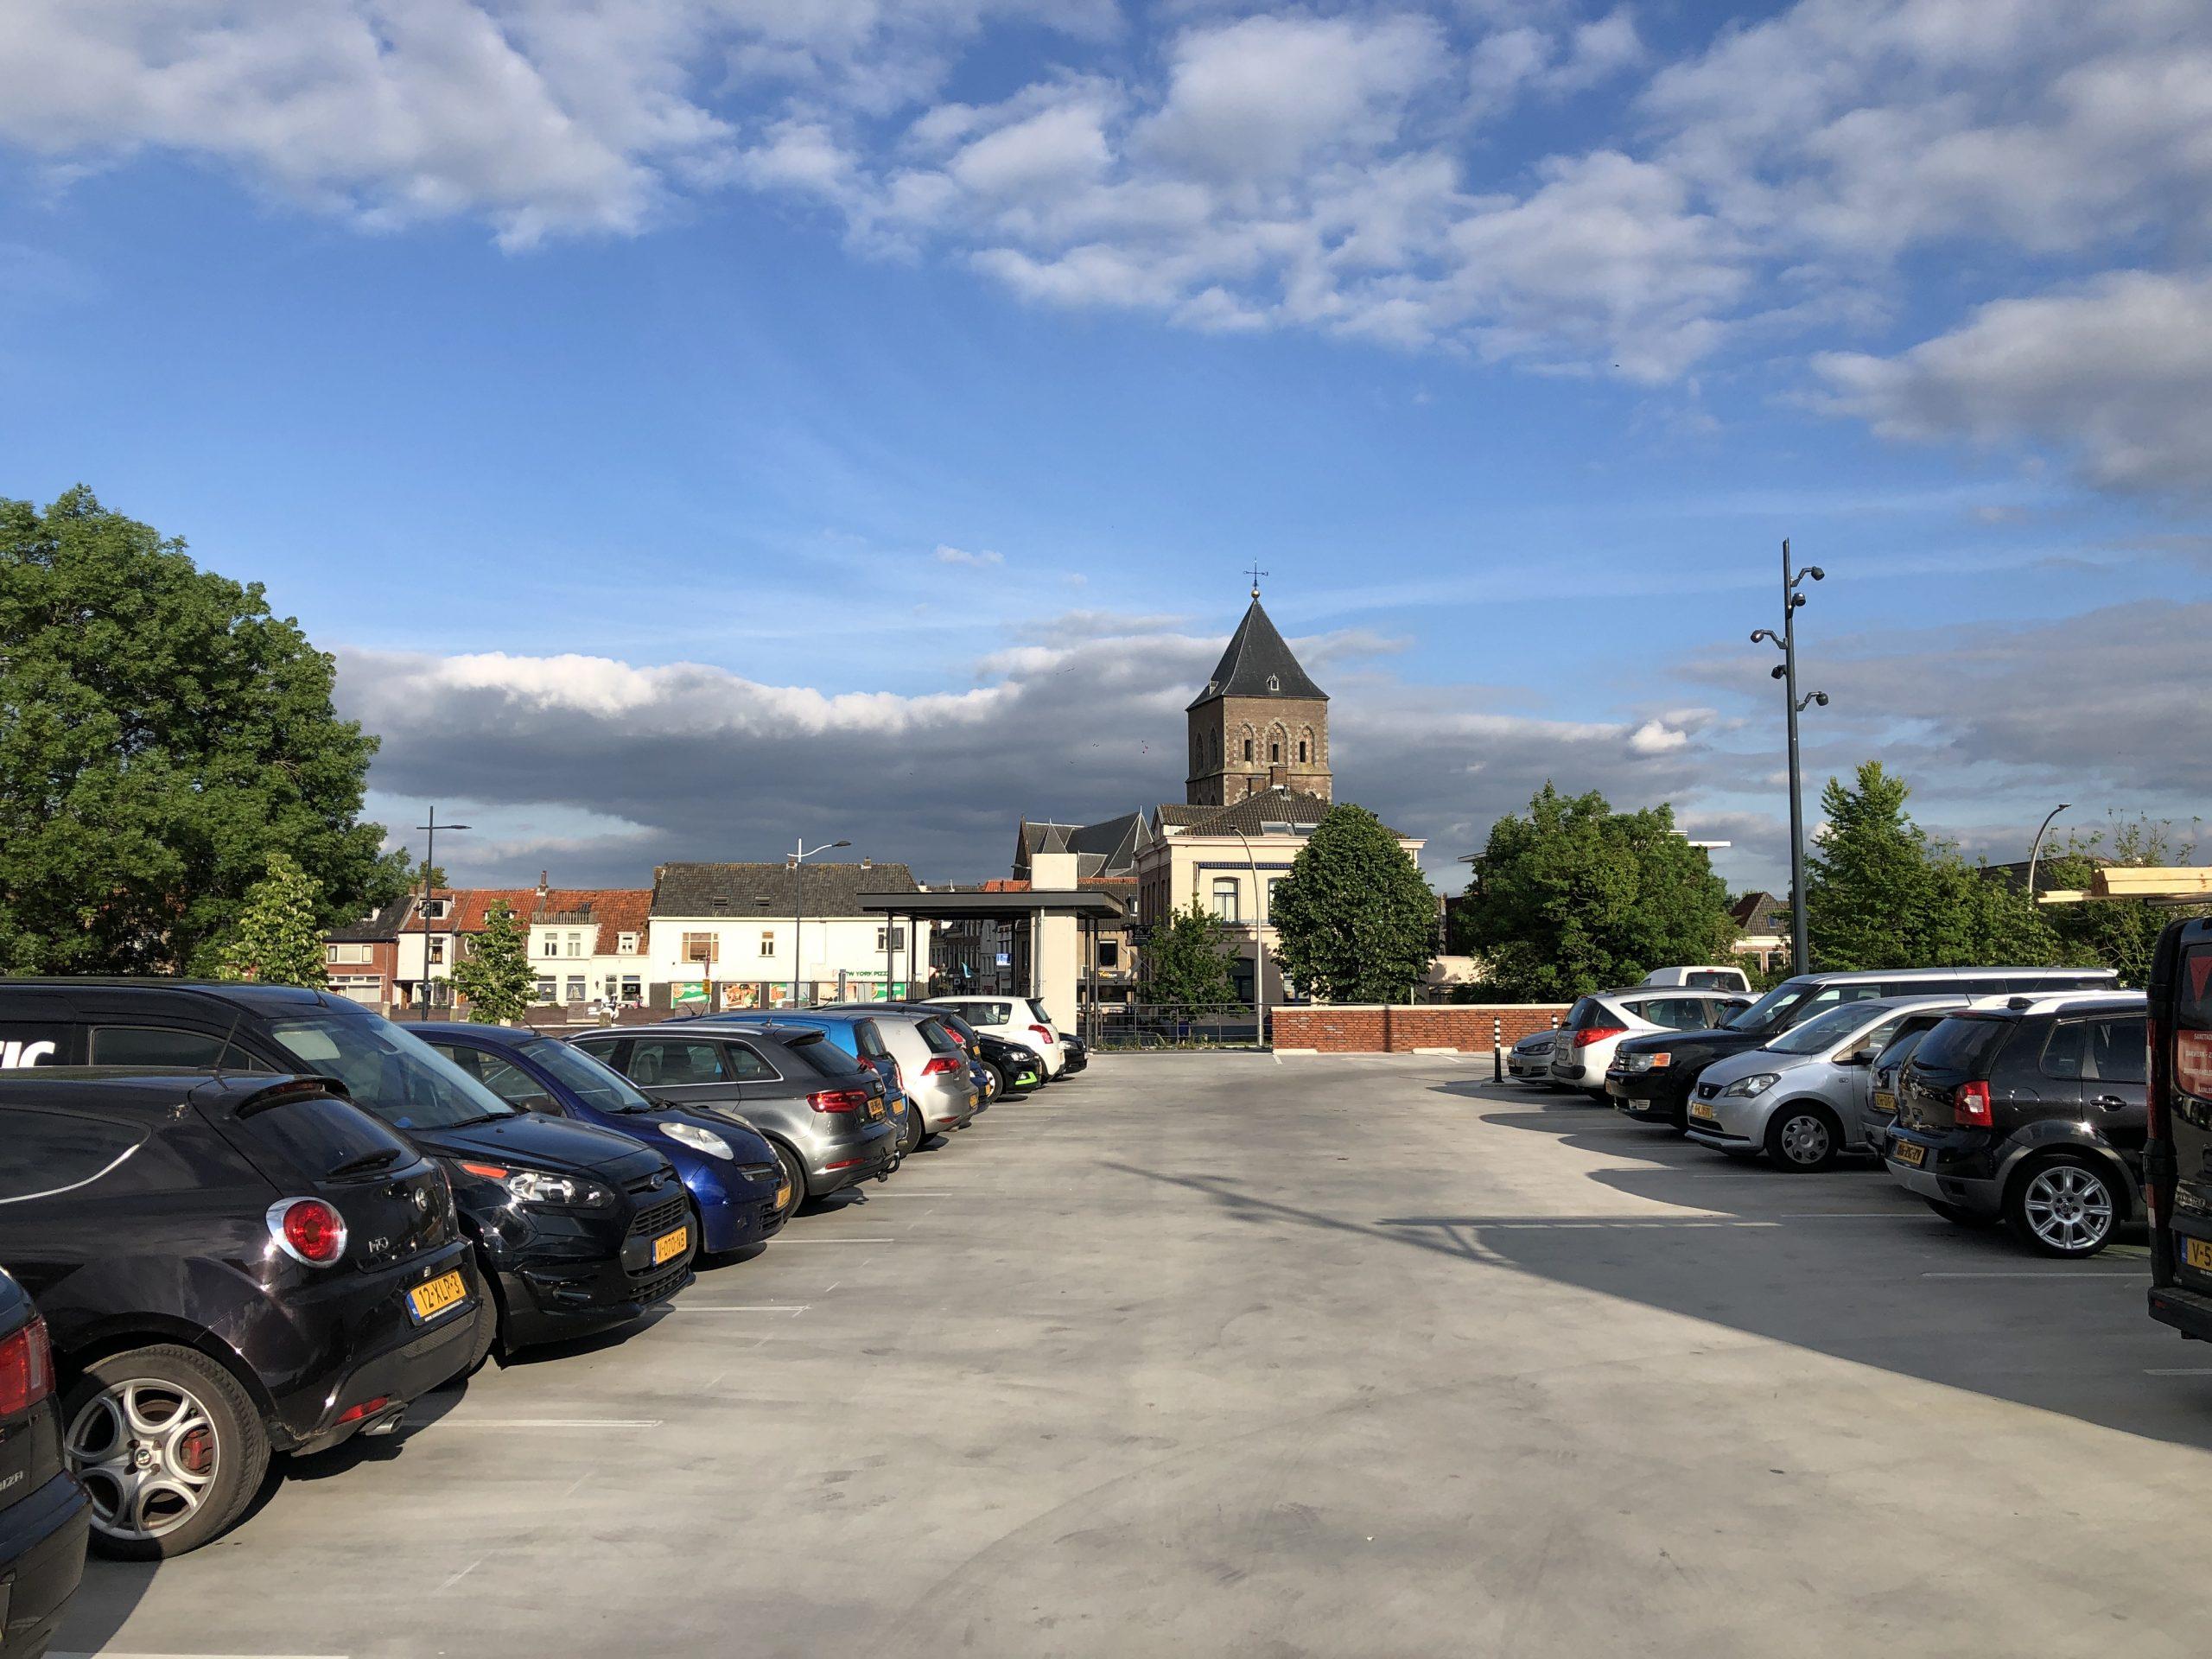 Raad van State bevestigt standpunt gemeente in dossier parkeergarage Buitenhaven